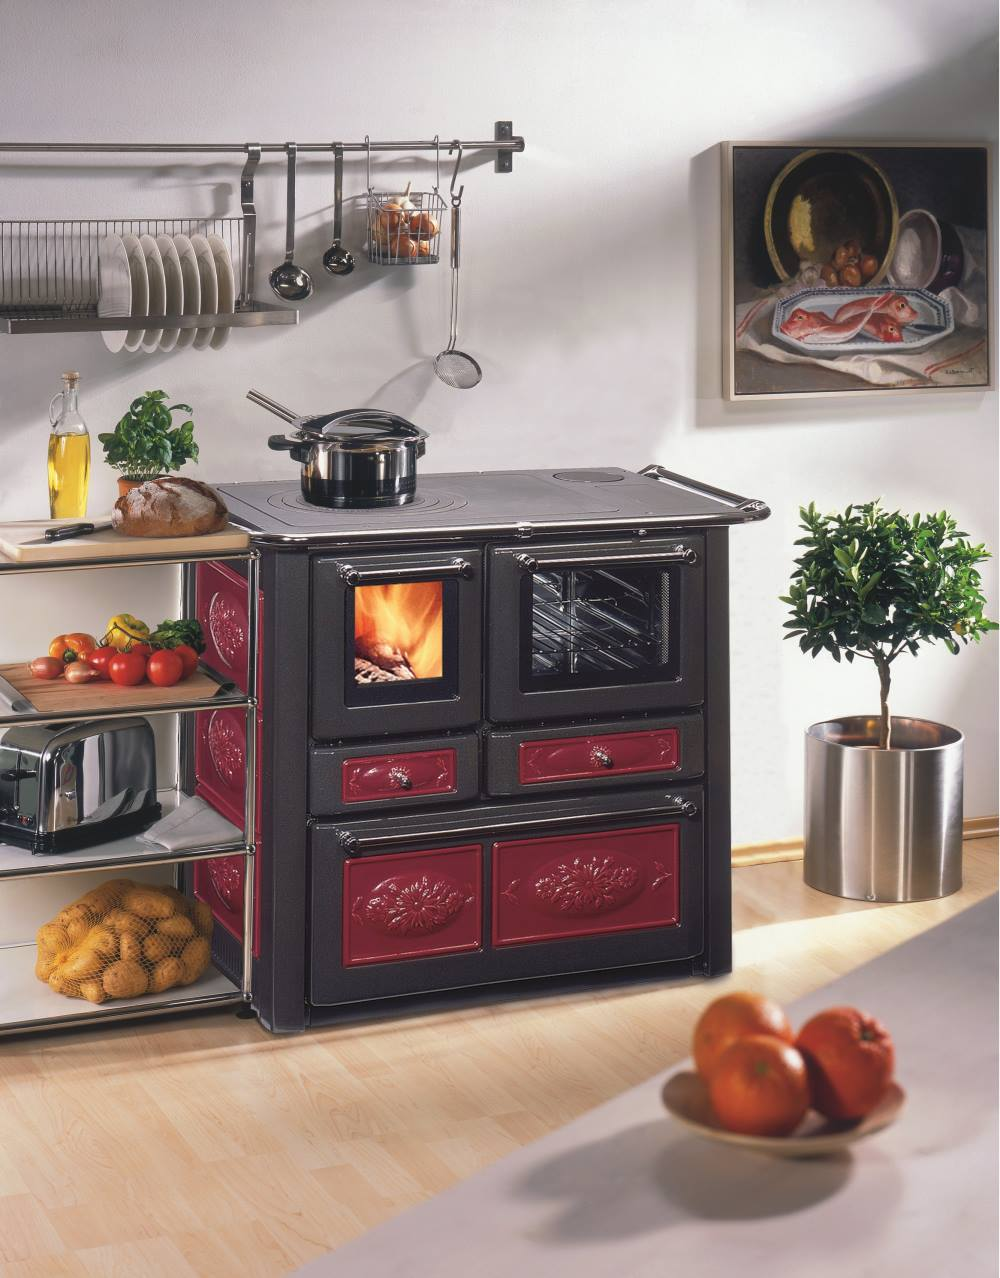 wamsler k185f a keramik bordeaux westminster landhausherd k chenherd energieeffizienzklasse a. Black Bedroom Furniture Sets. Home Design Ideas